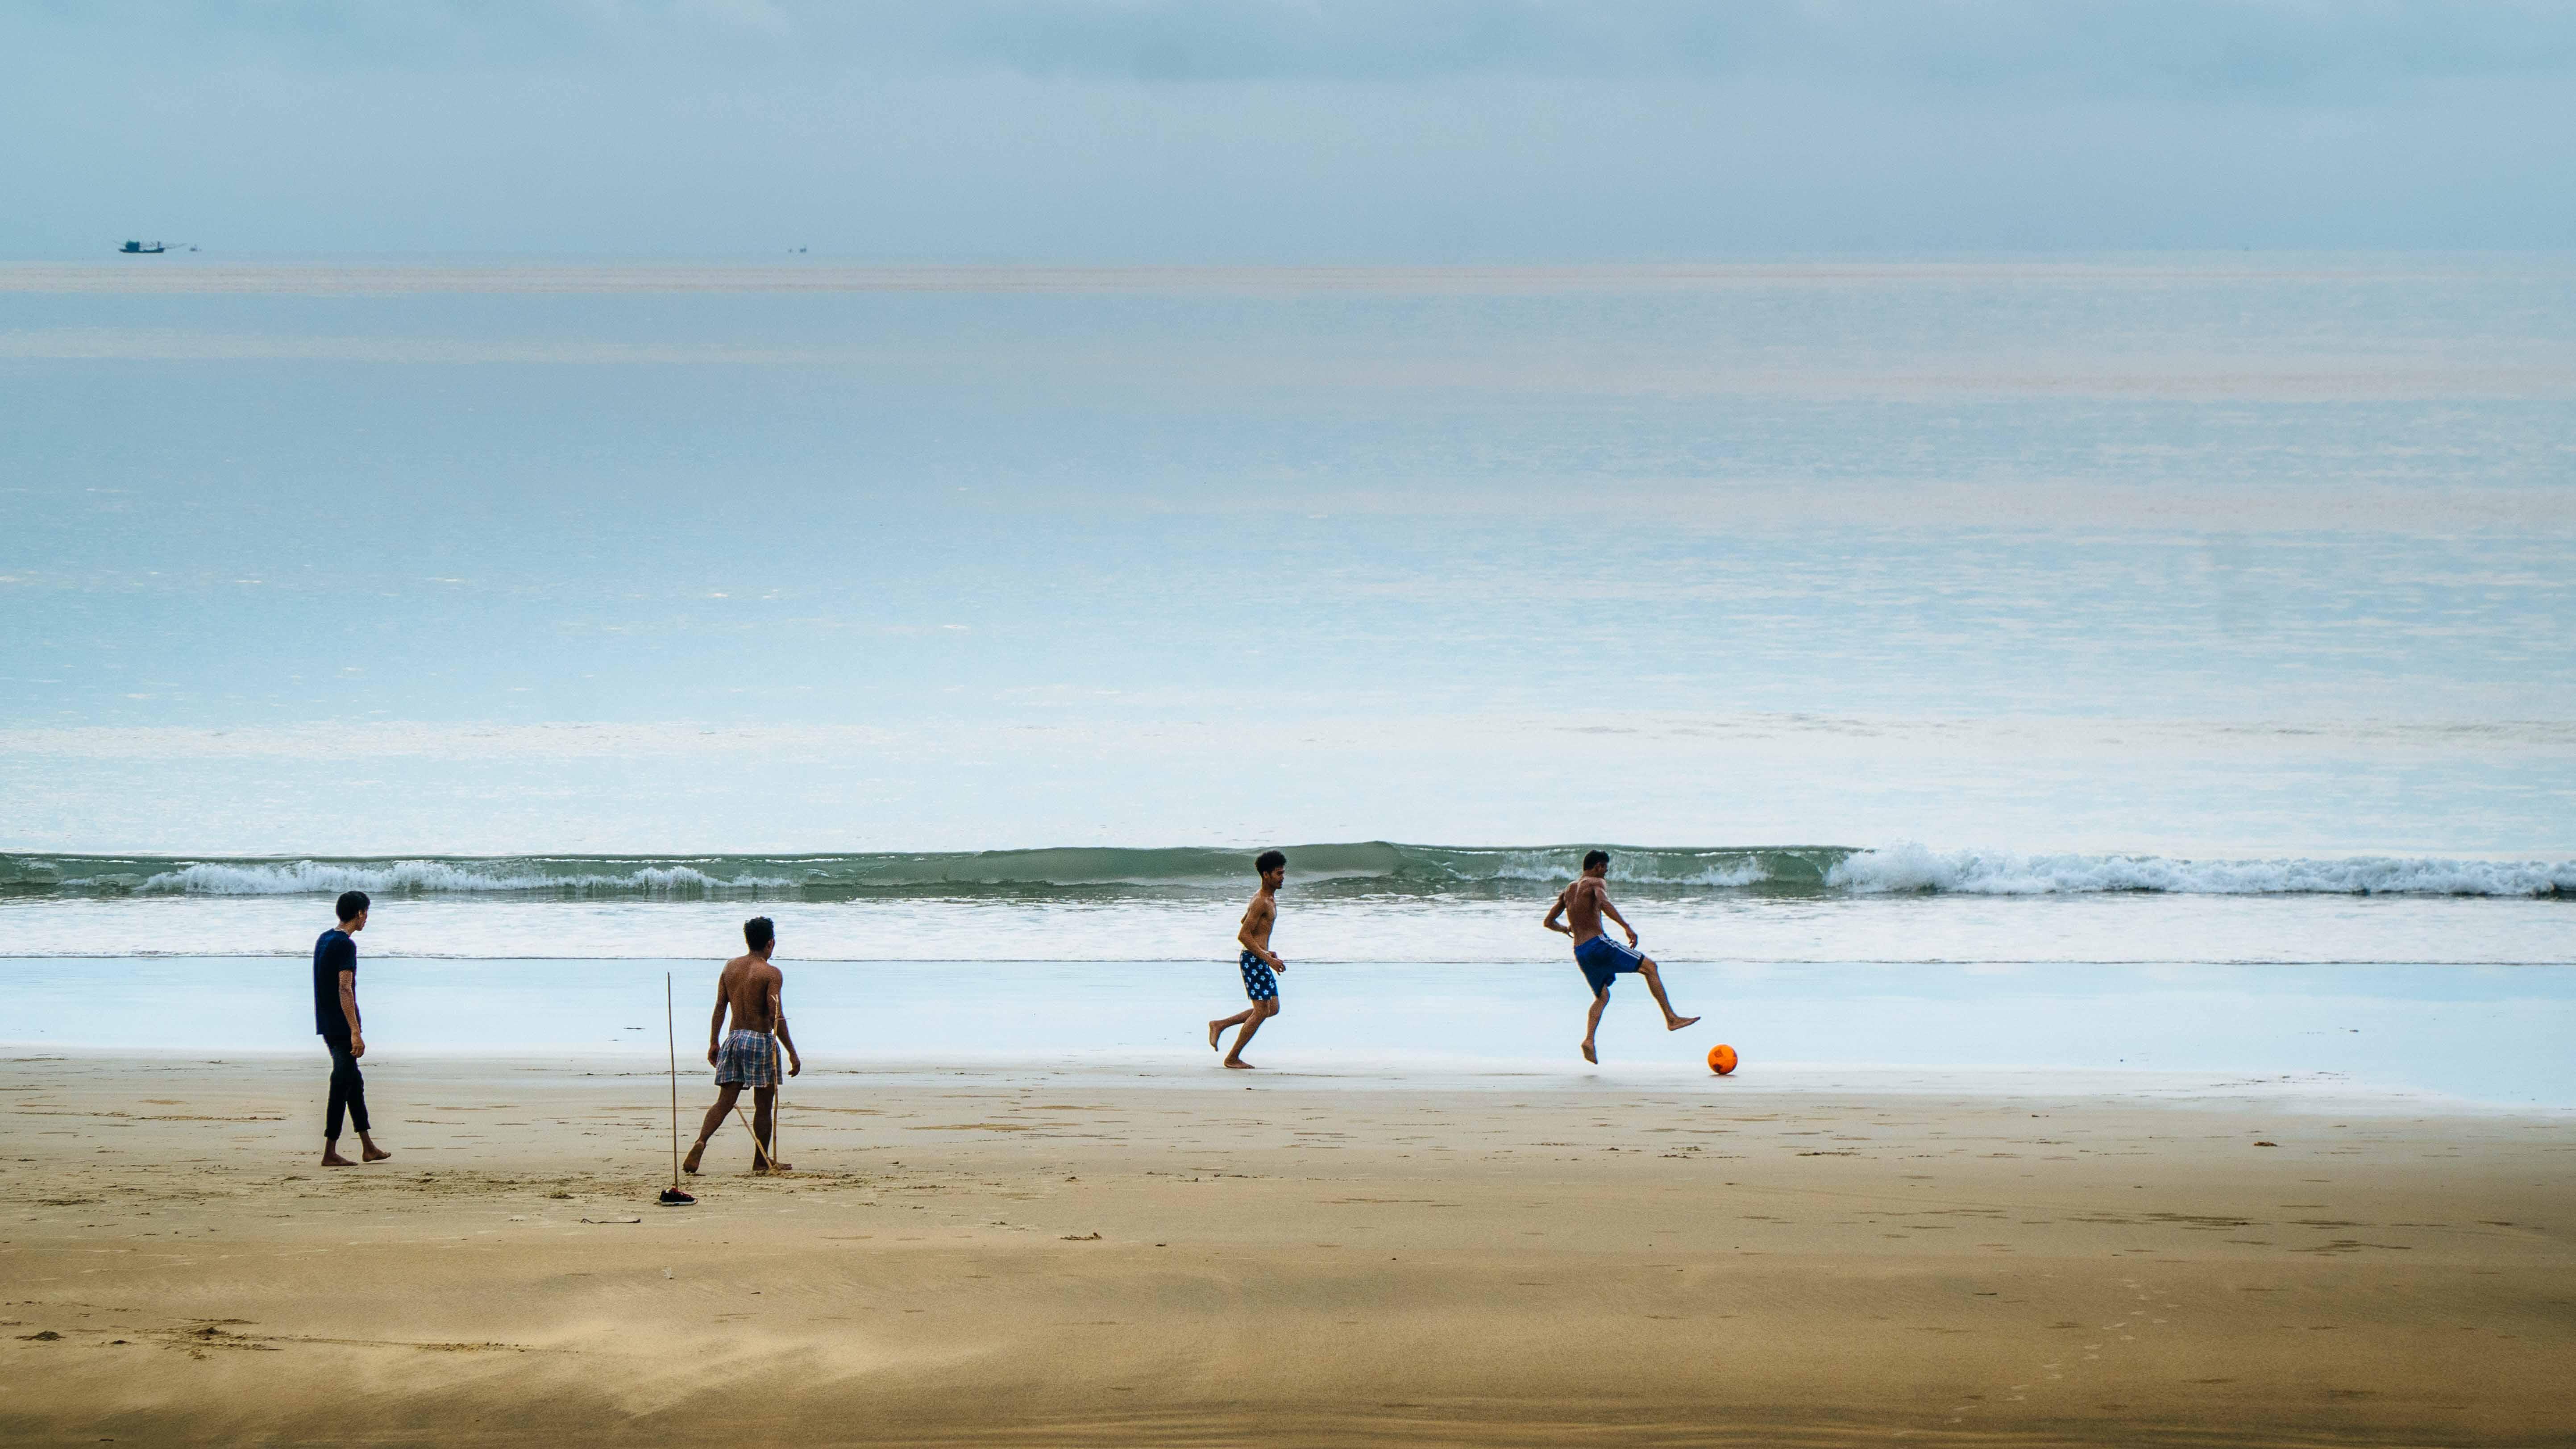 Football on the beach in Myanmar